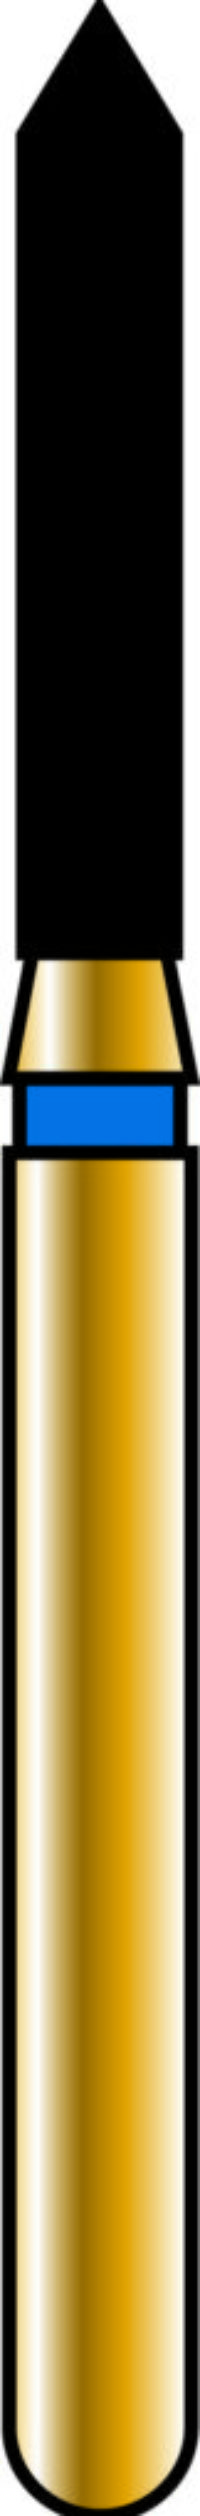 Pointed Cylinder 14-8mm Gold Diamond Bur